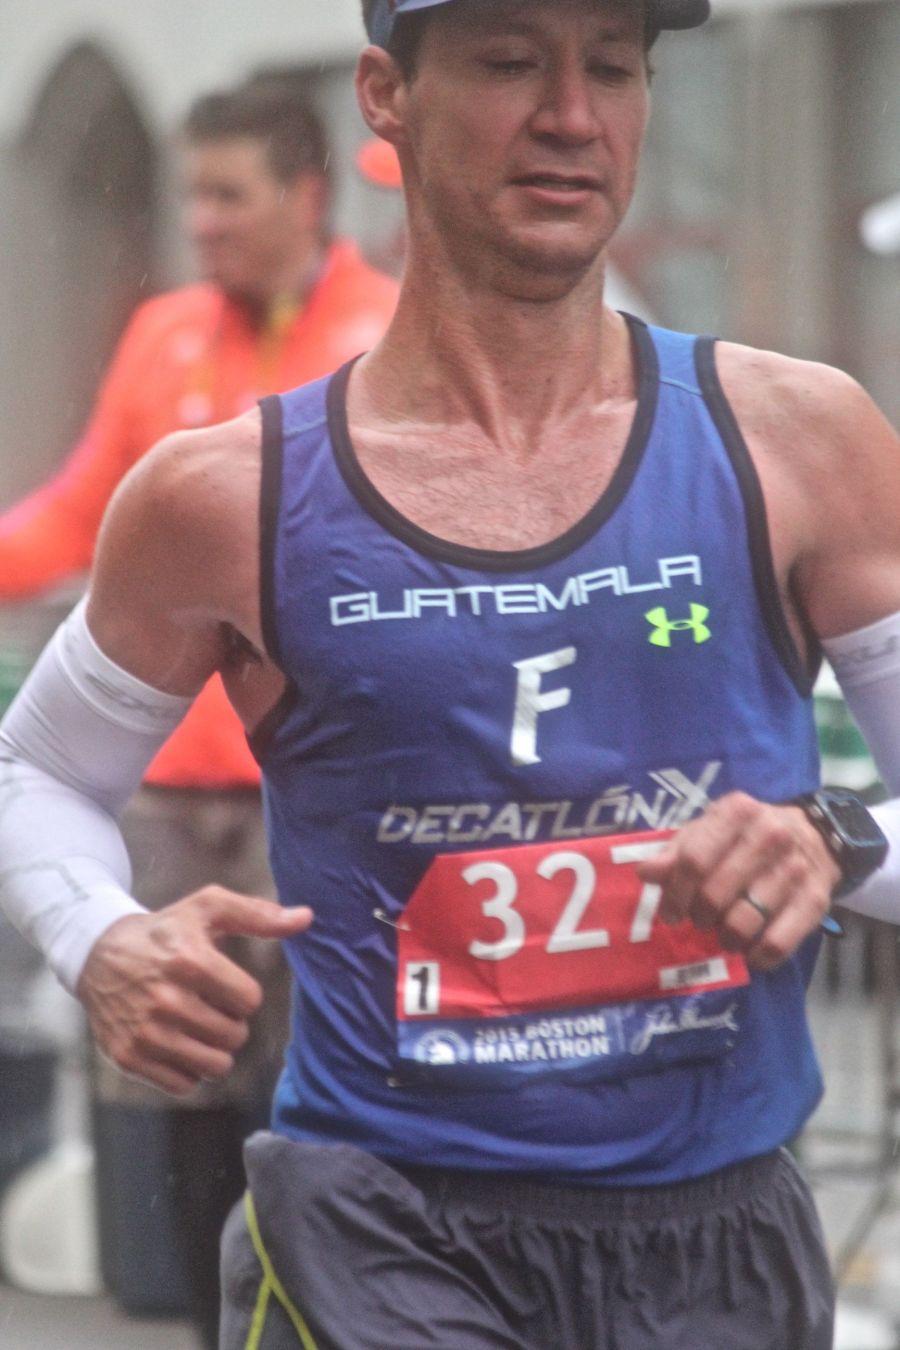 boston marathon april 20 2015 racer number 327